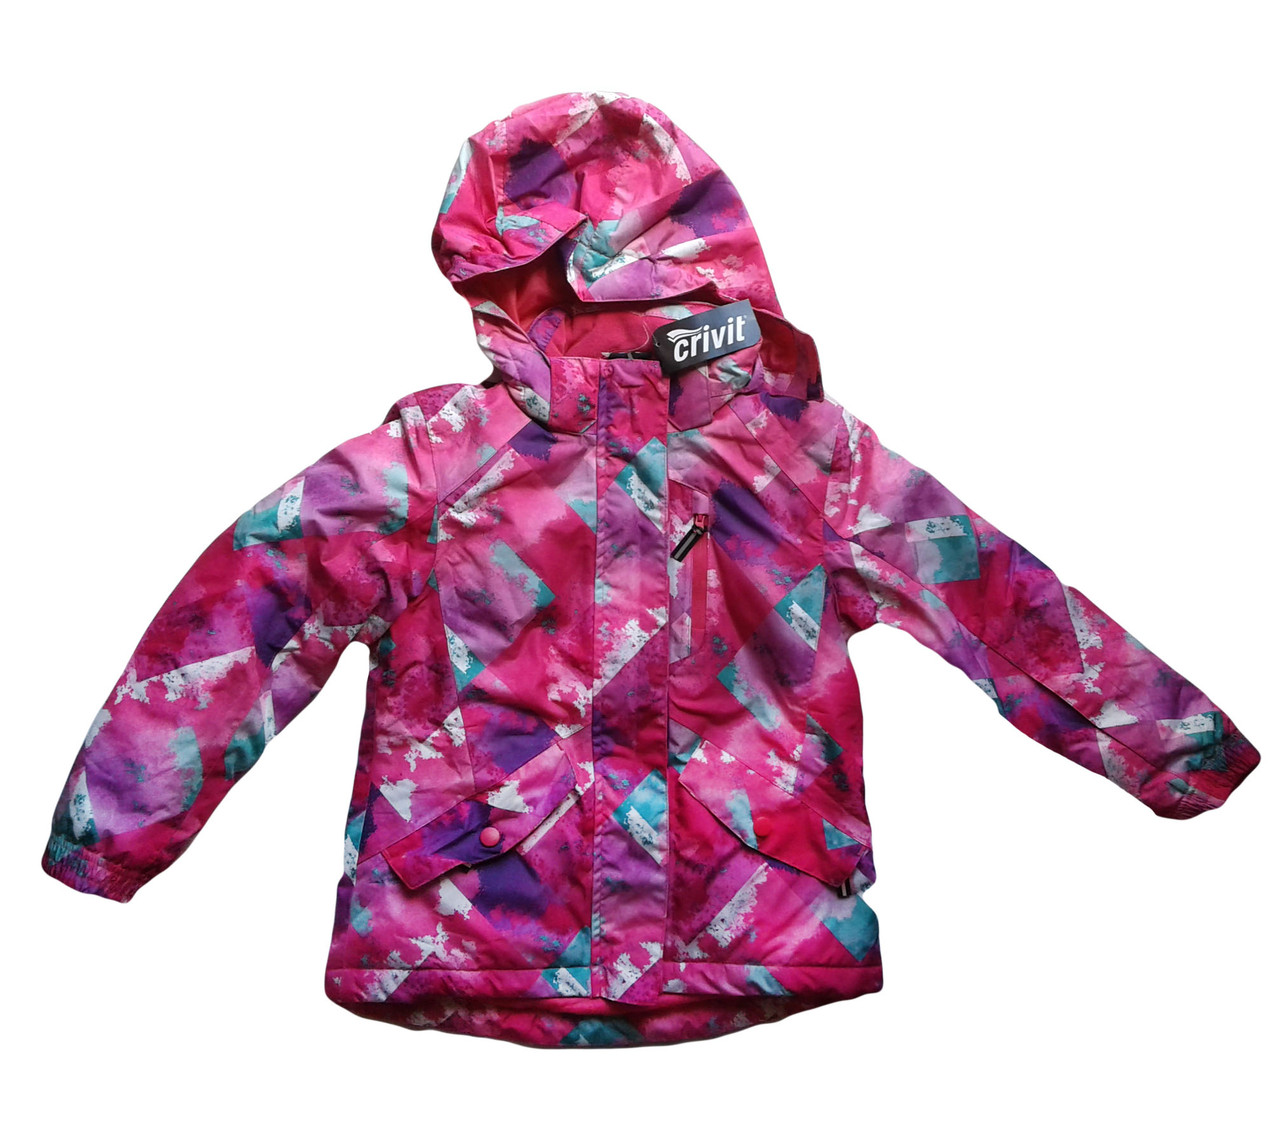 Куртка для девочки, Crivit, размеры 134/140(2 шт), арт. Л-435